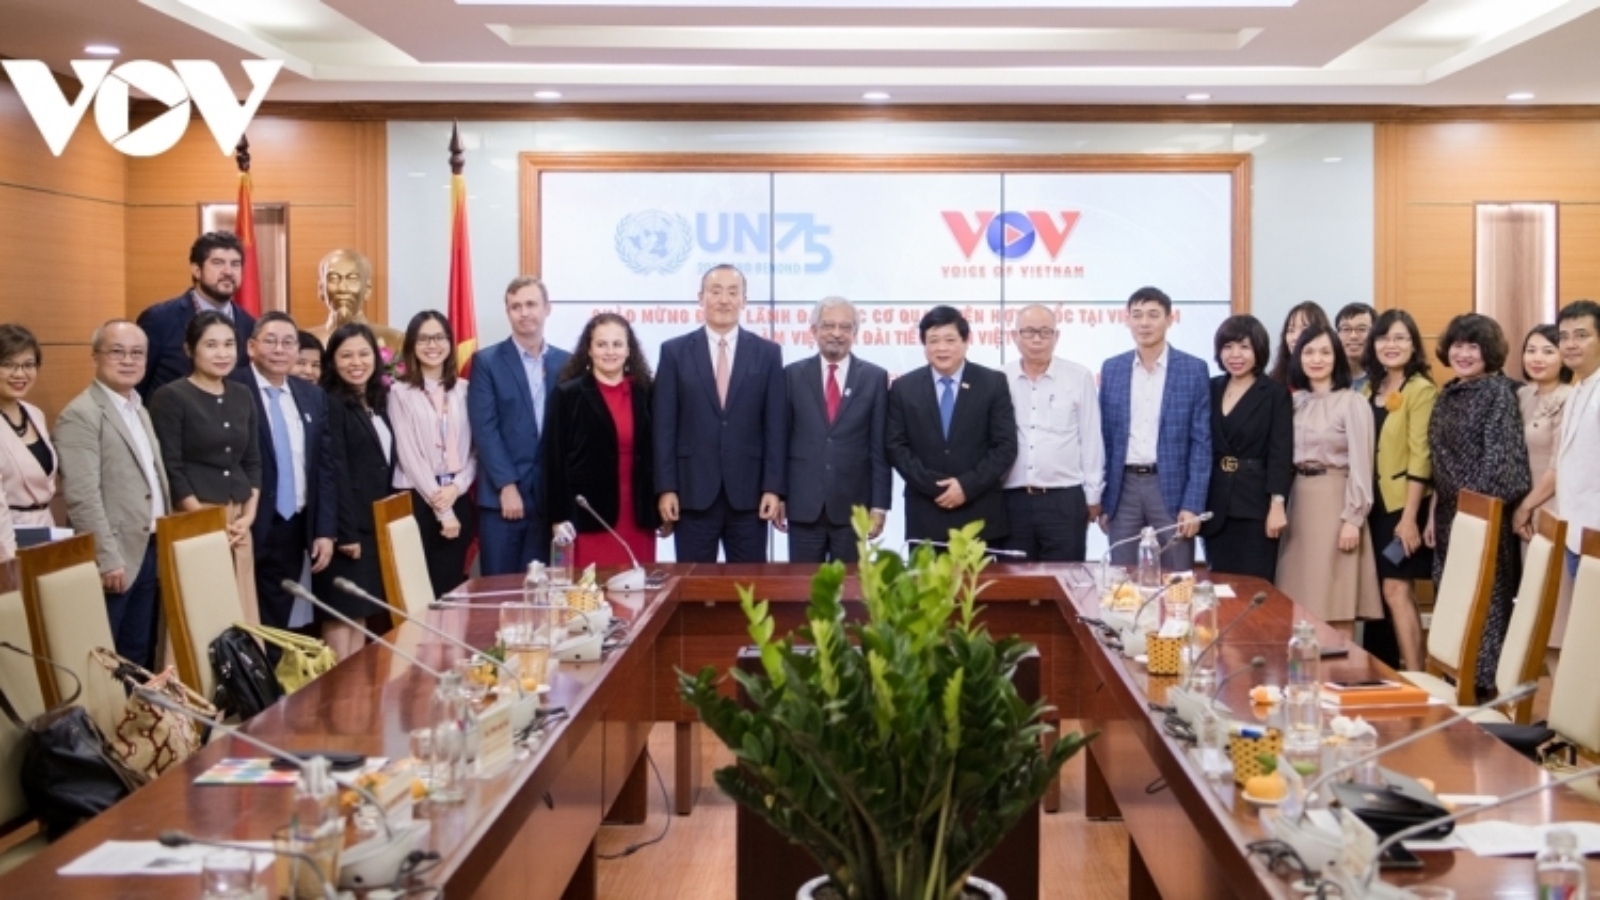 VOV vows to work closely alongside UN agencies in Vietnam